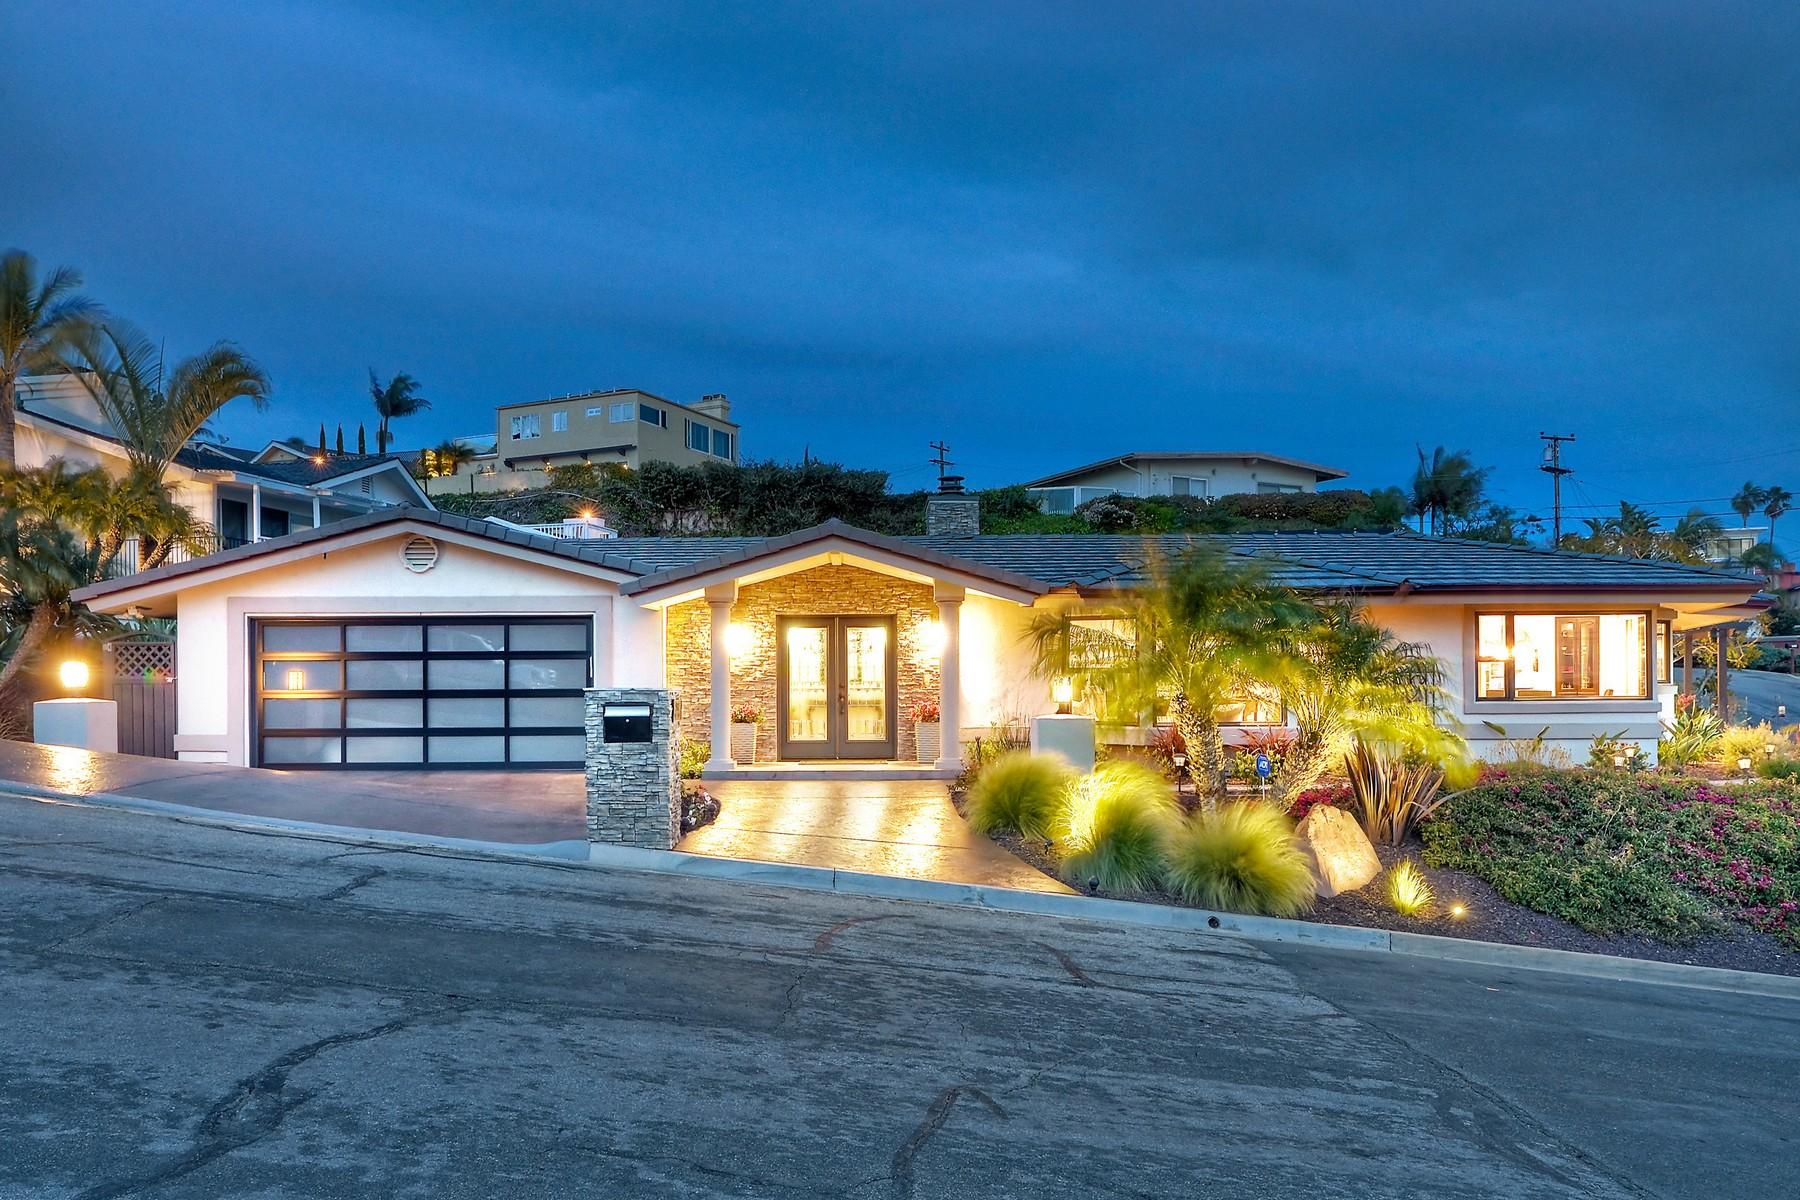 Single Family Home for Sale at 5701 Skylark Place La Jolla, California, 92037 United States